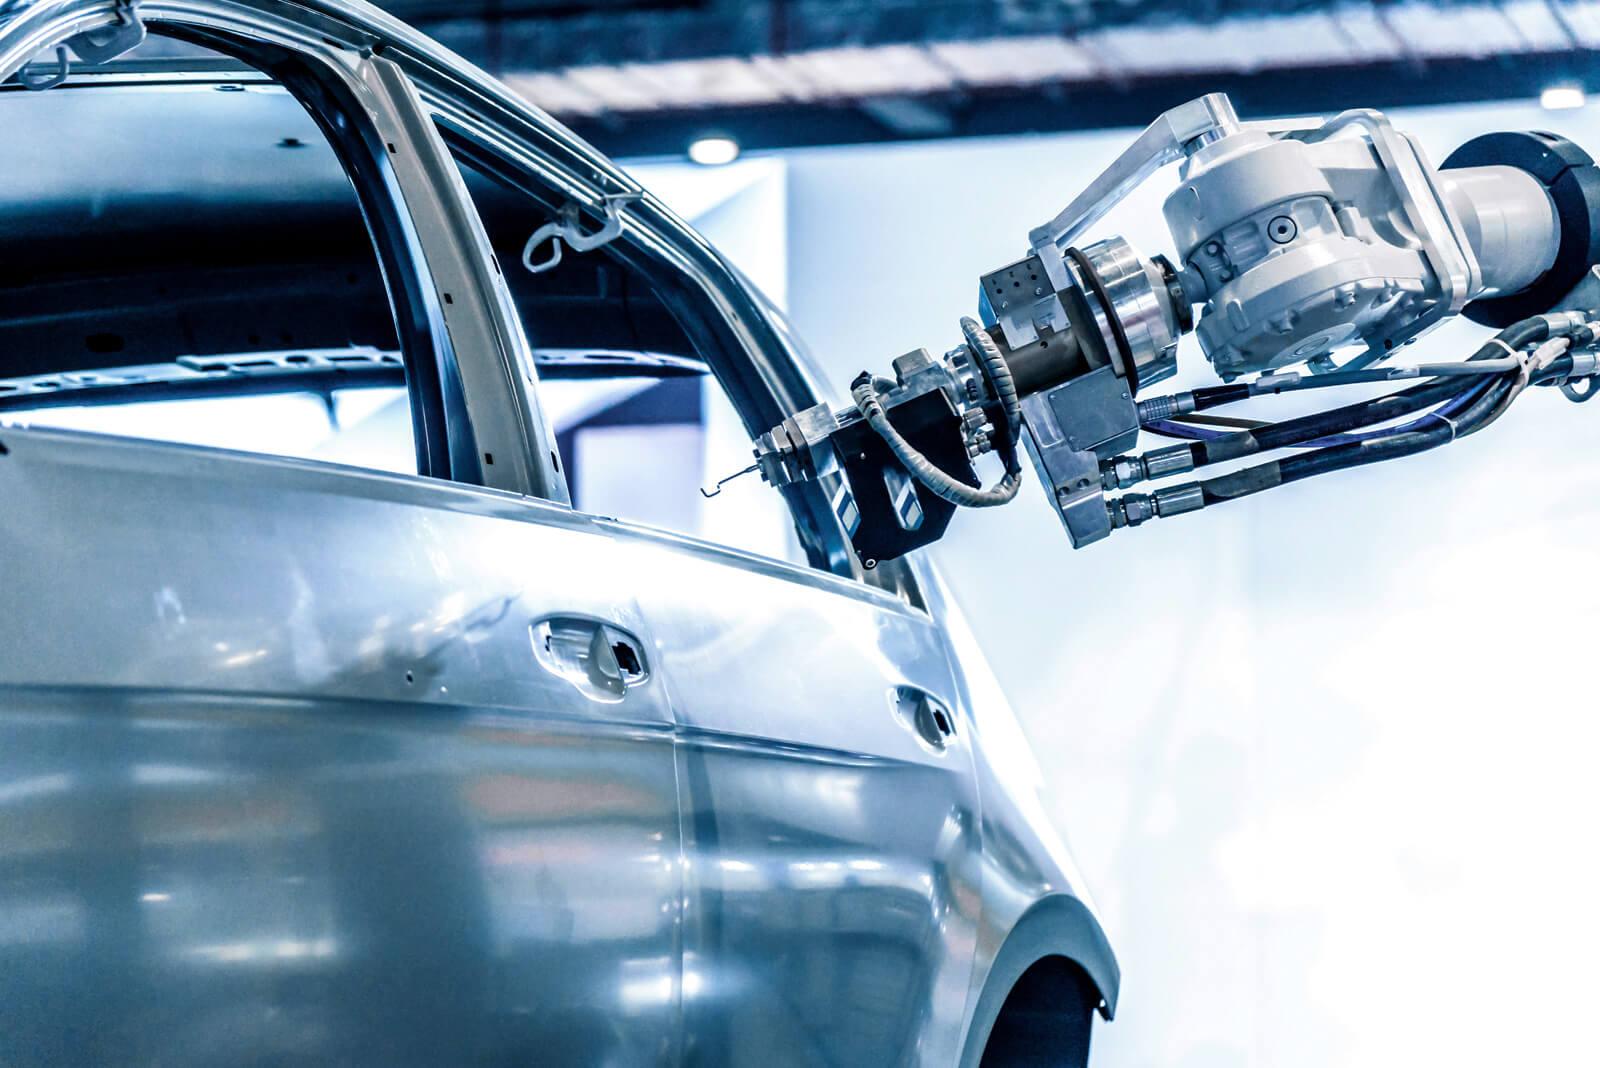 Business-IoT-Plattformen: Roboter produziert Auto